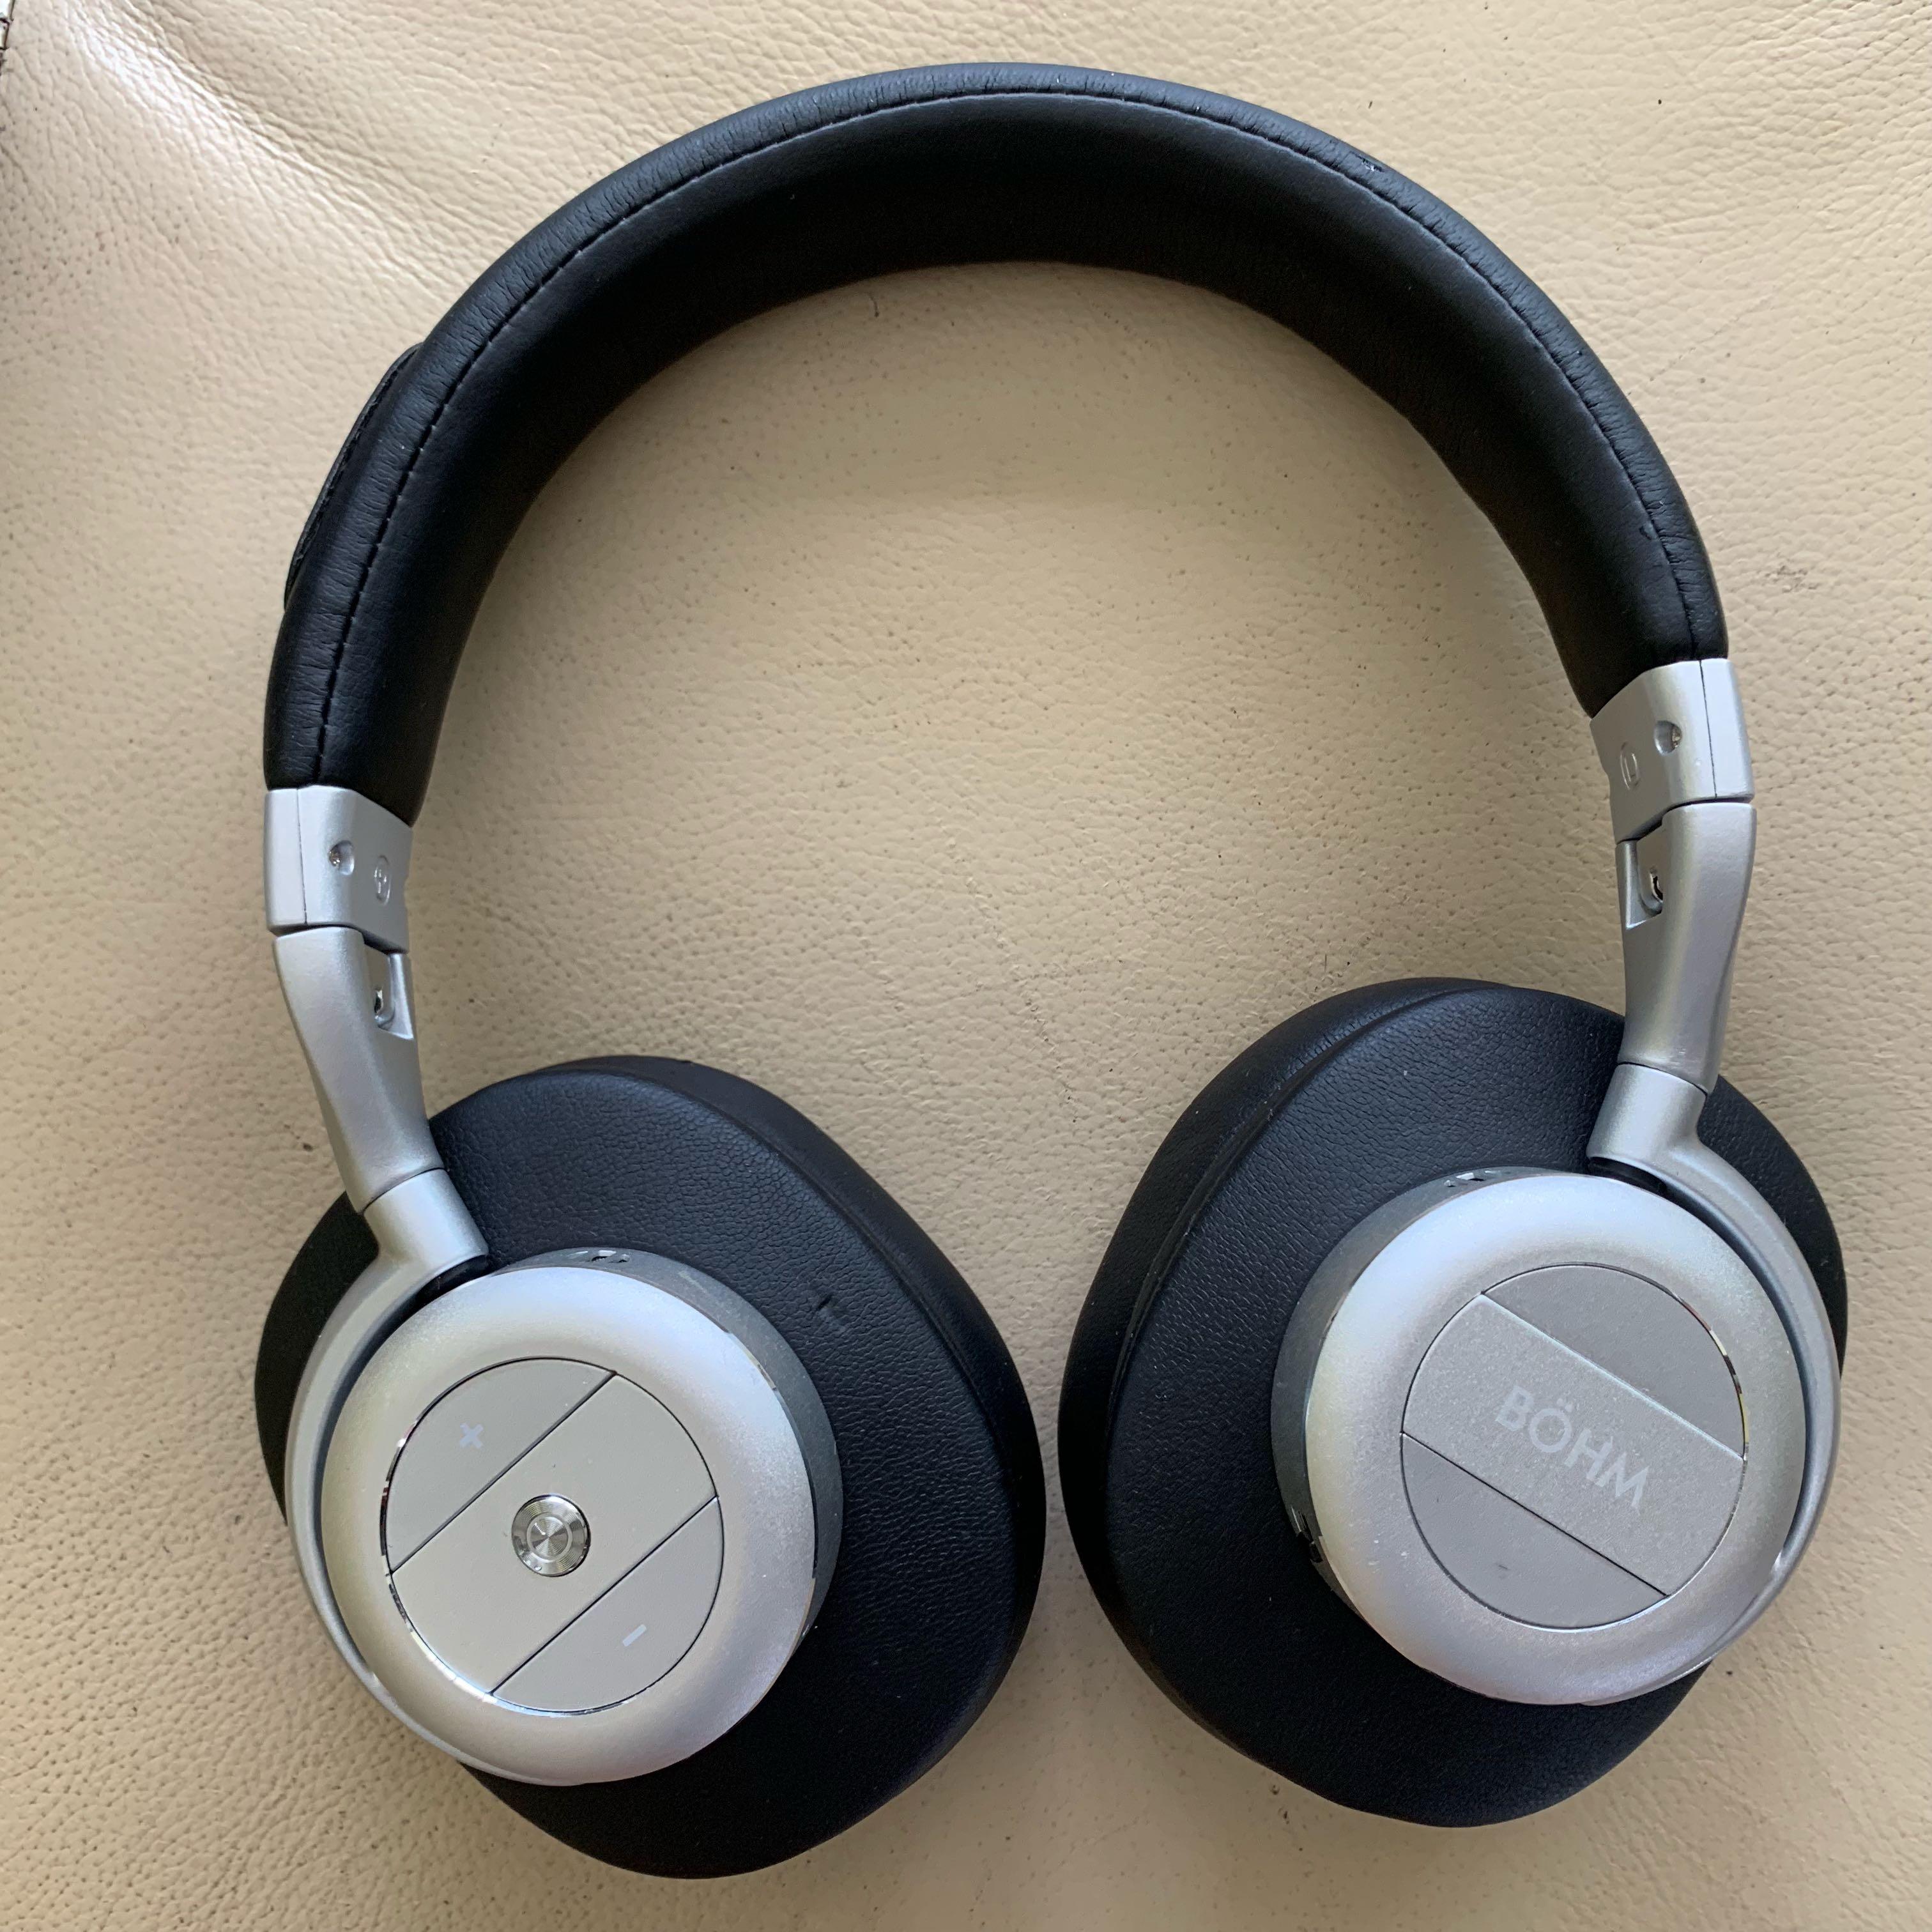 ea509185c68 BÖHM / BOHM B76 Wireless Active Noise Cancelling Headphones, Electronics,  Audio on Carousell